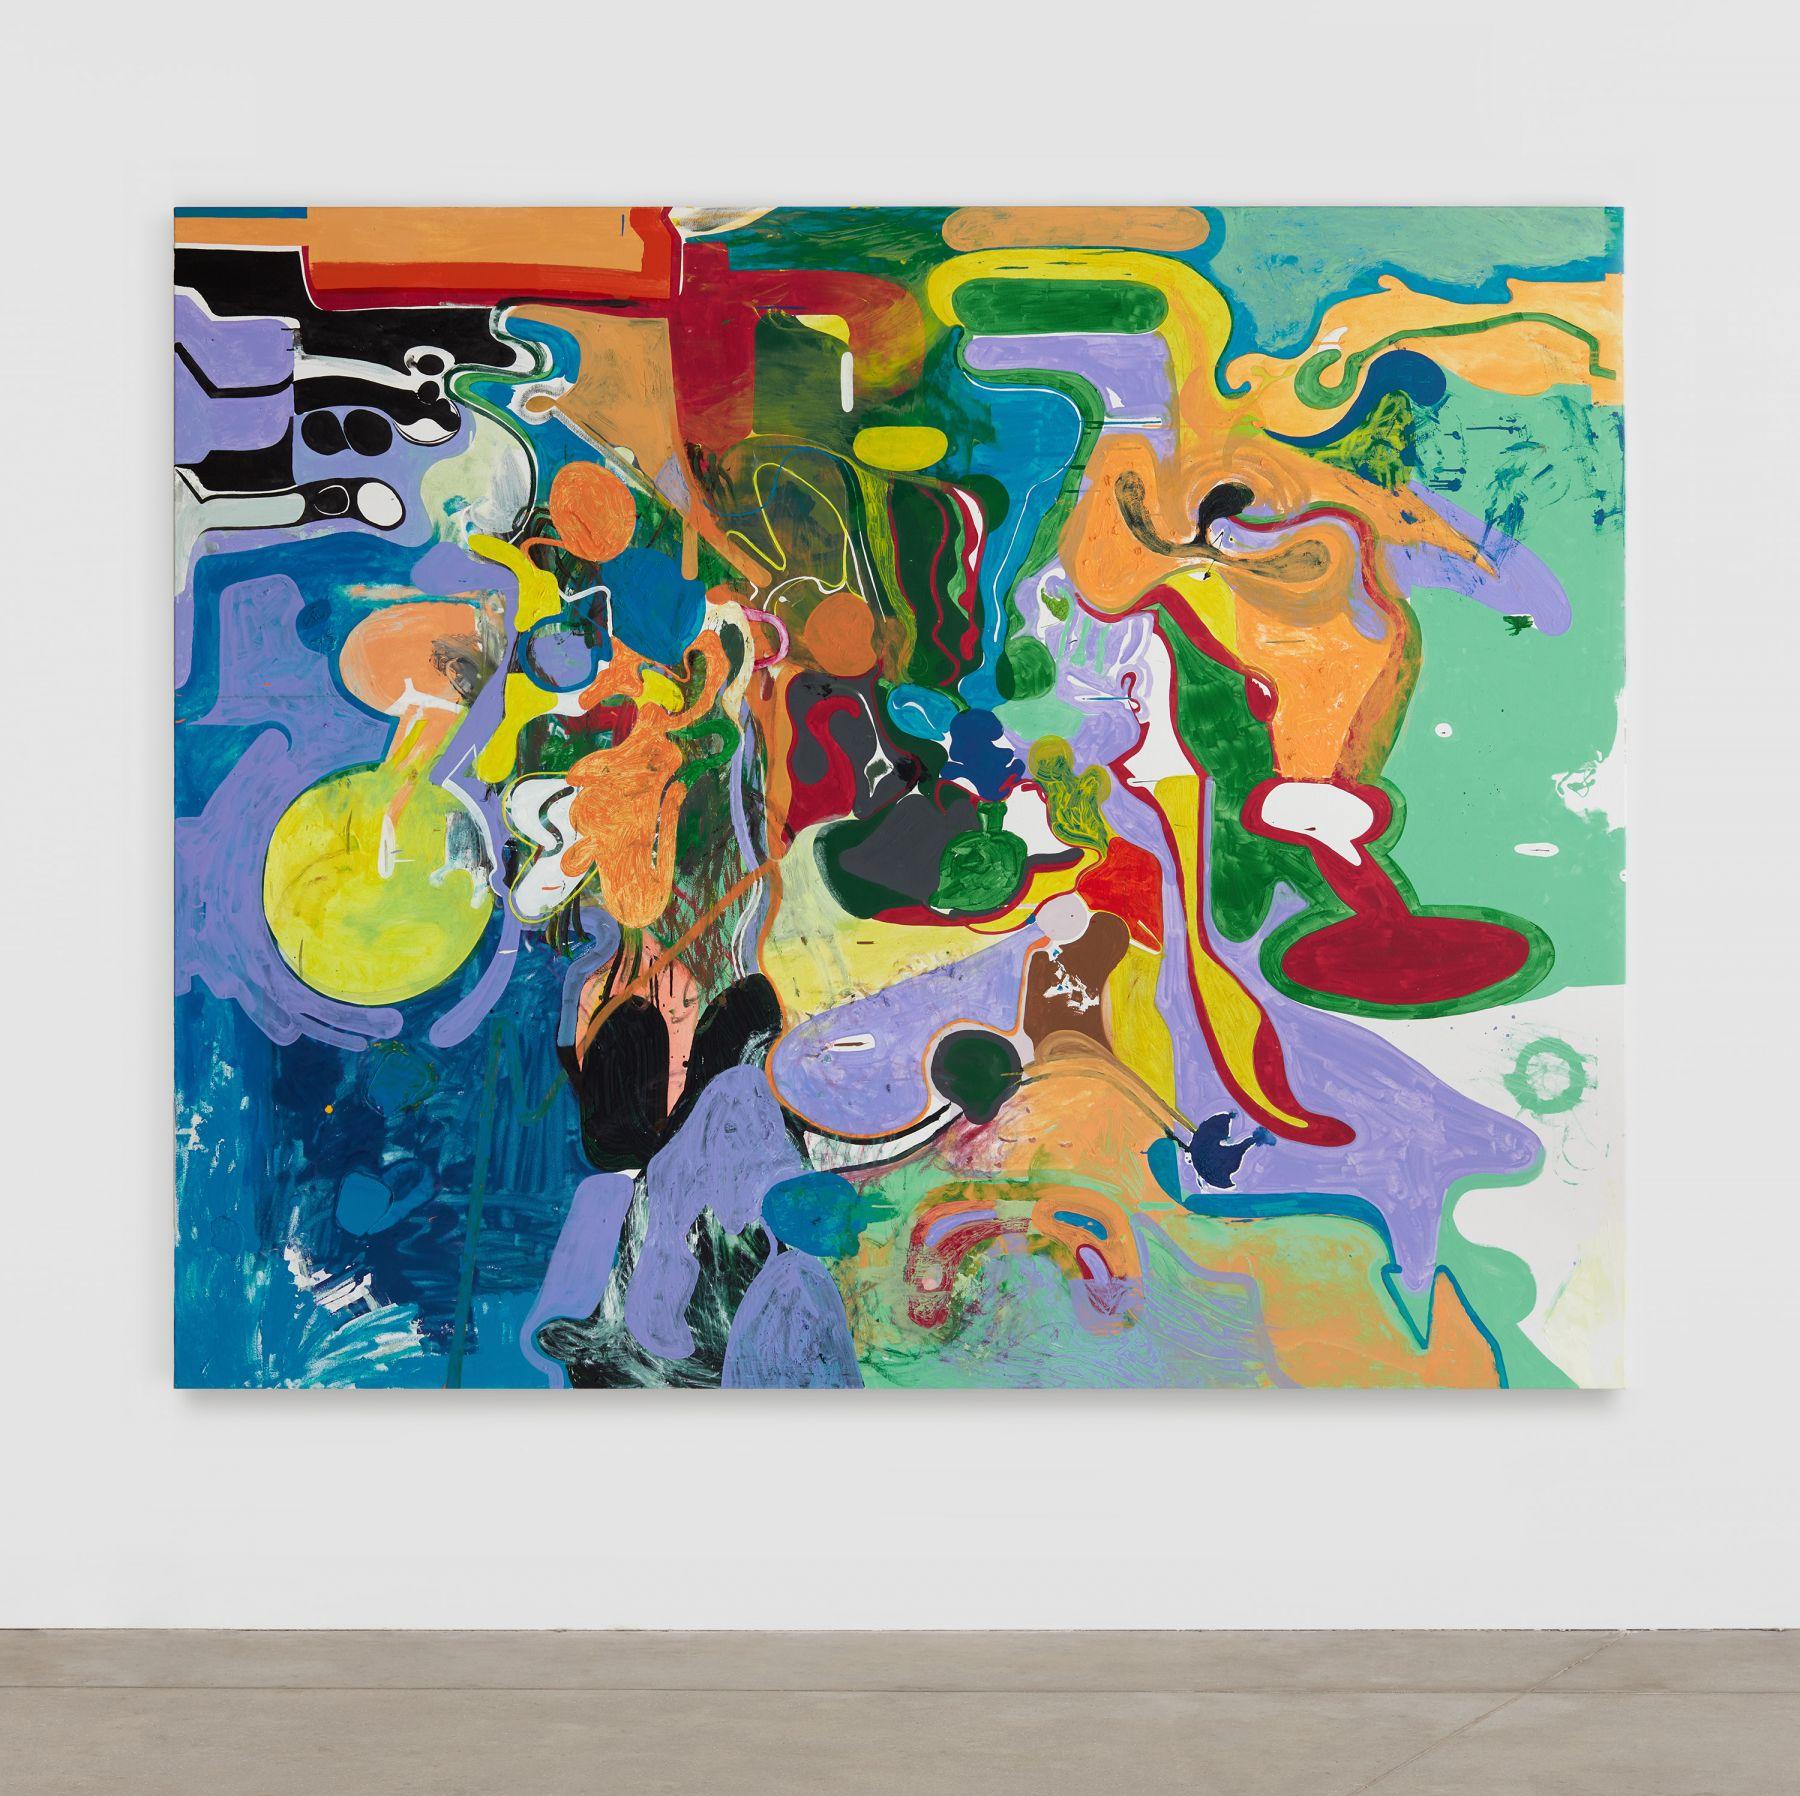 Michael Williams Plein Air Painting Under Fire, 2018